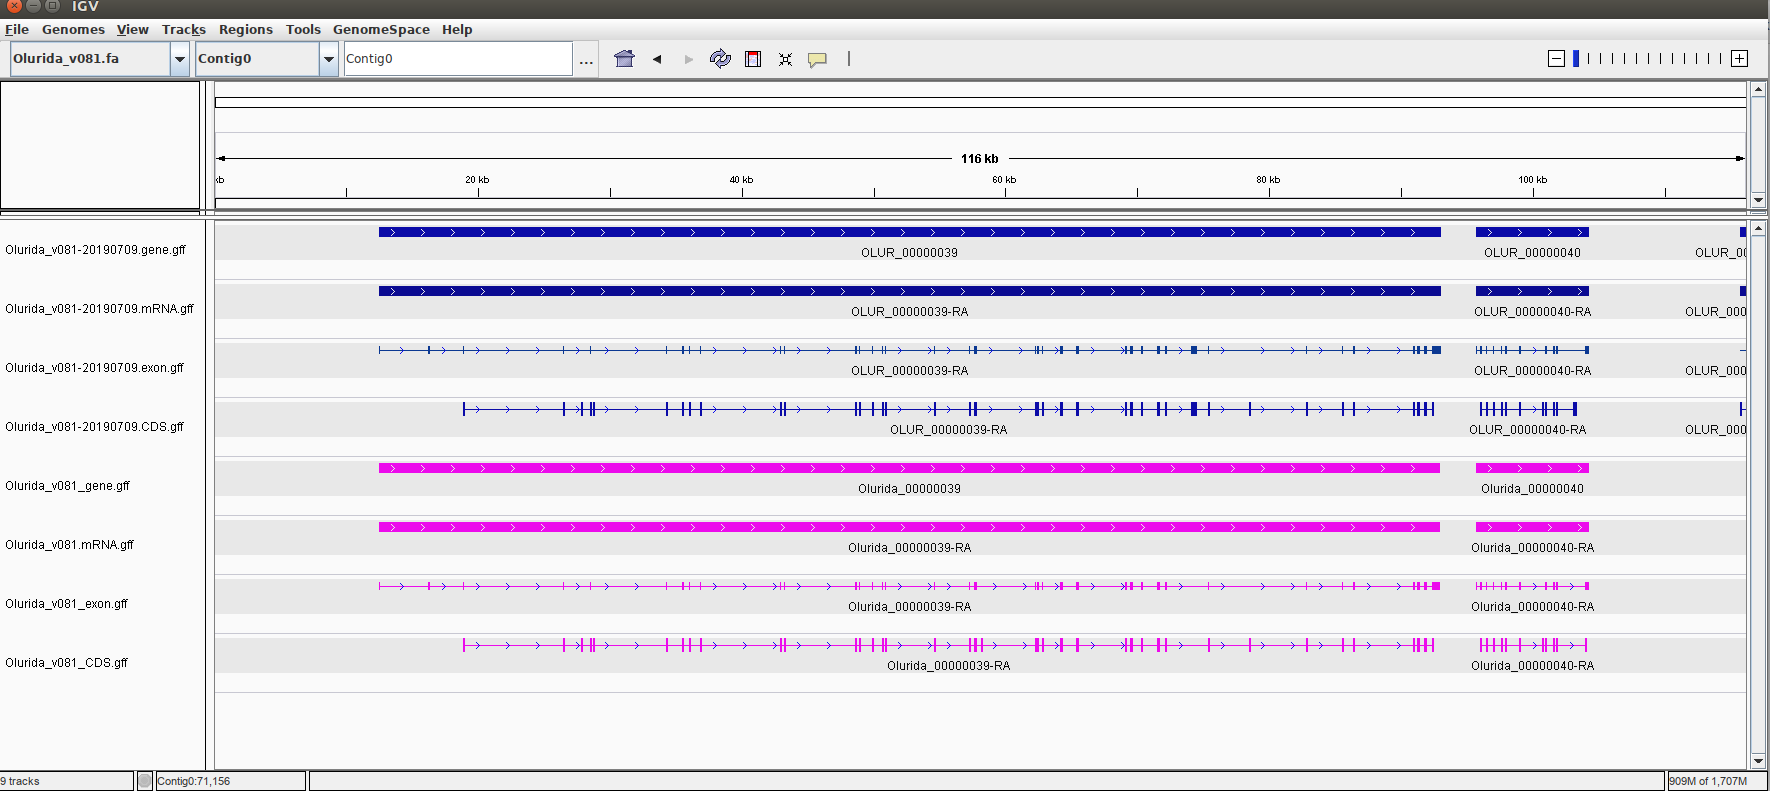 IGV screencap showing same annotations between original v081 and current v081 annotations